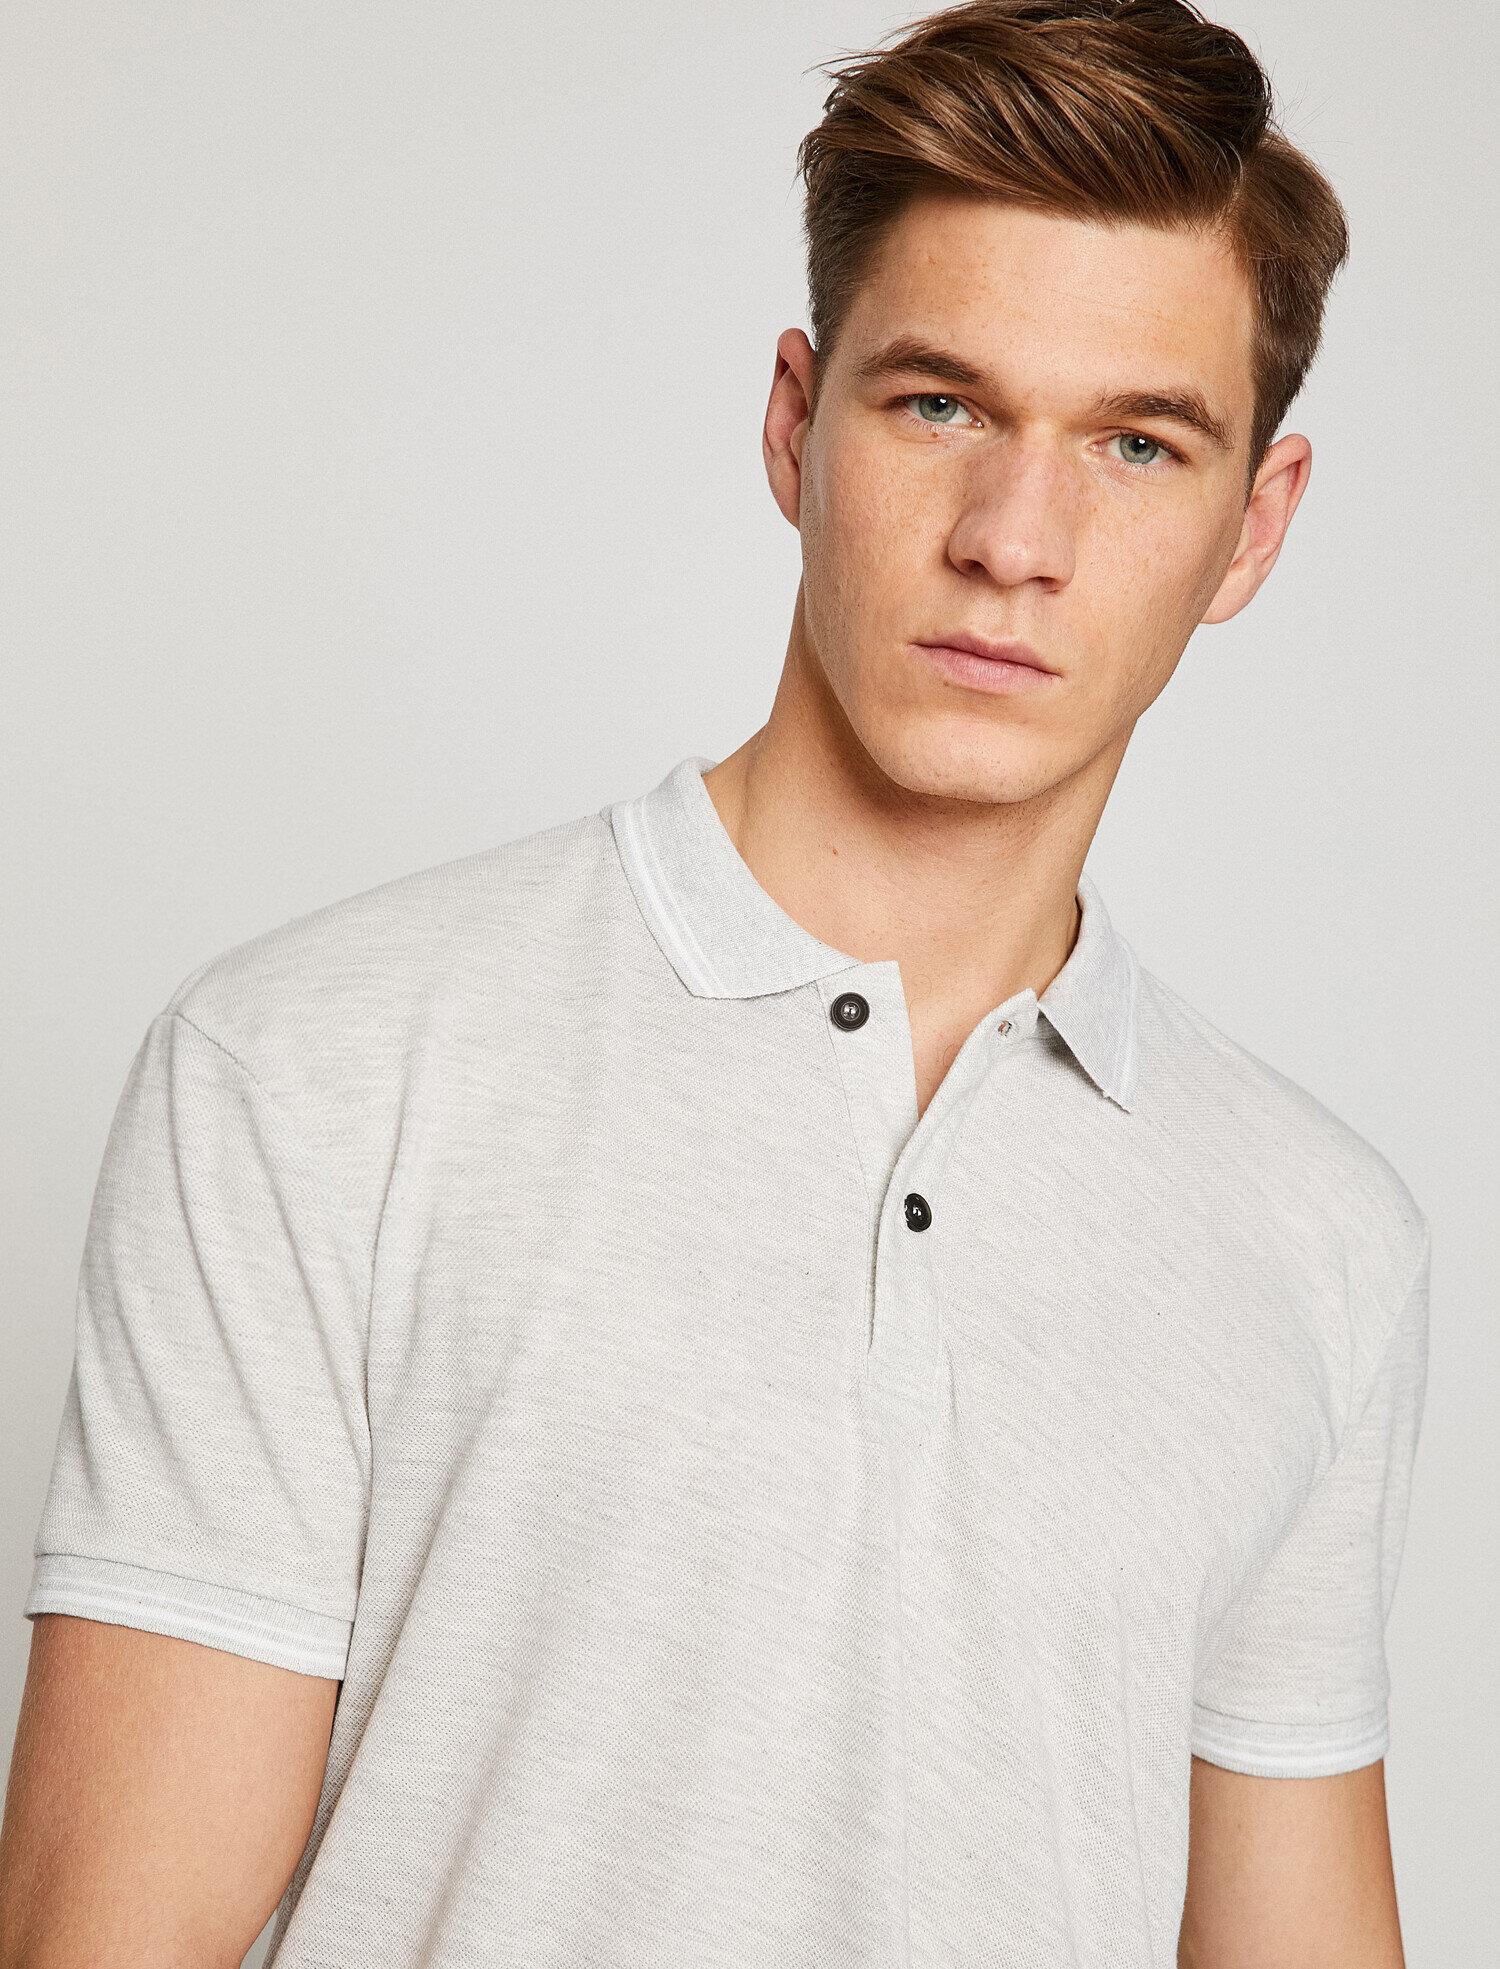 Koton Erkek Polo Yaka T-Shirt Gri Ürün Resmi